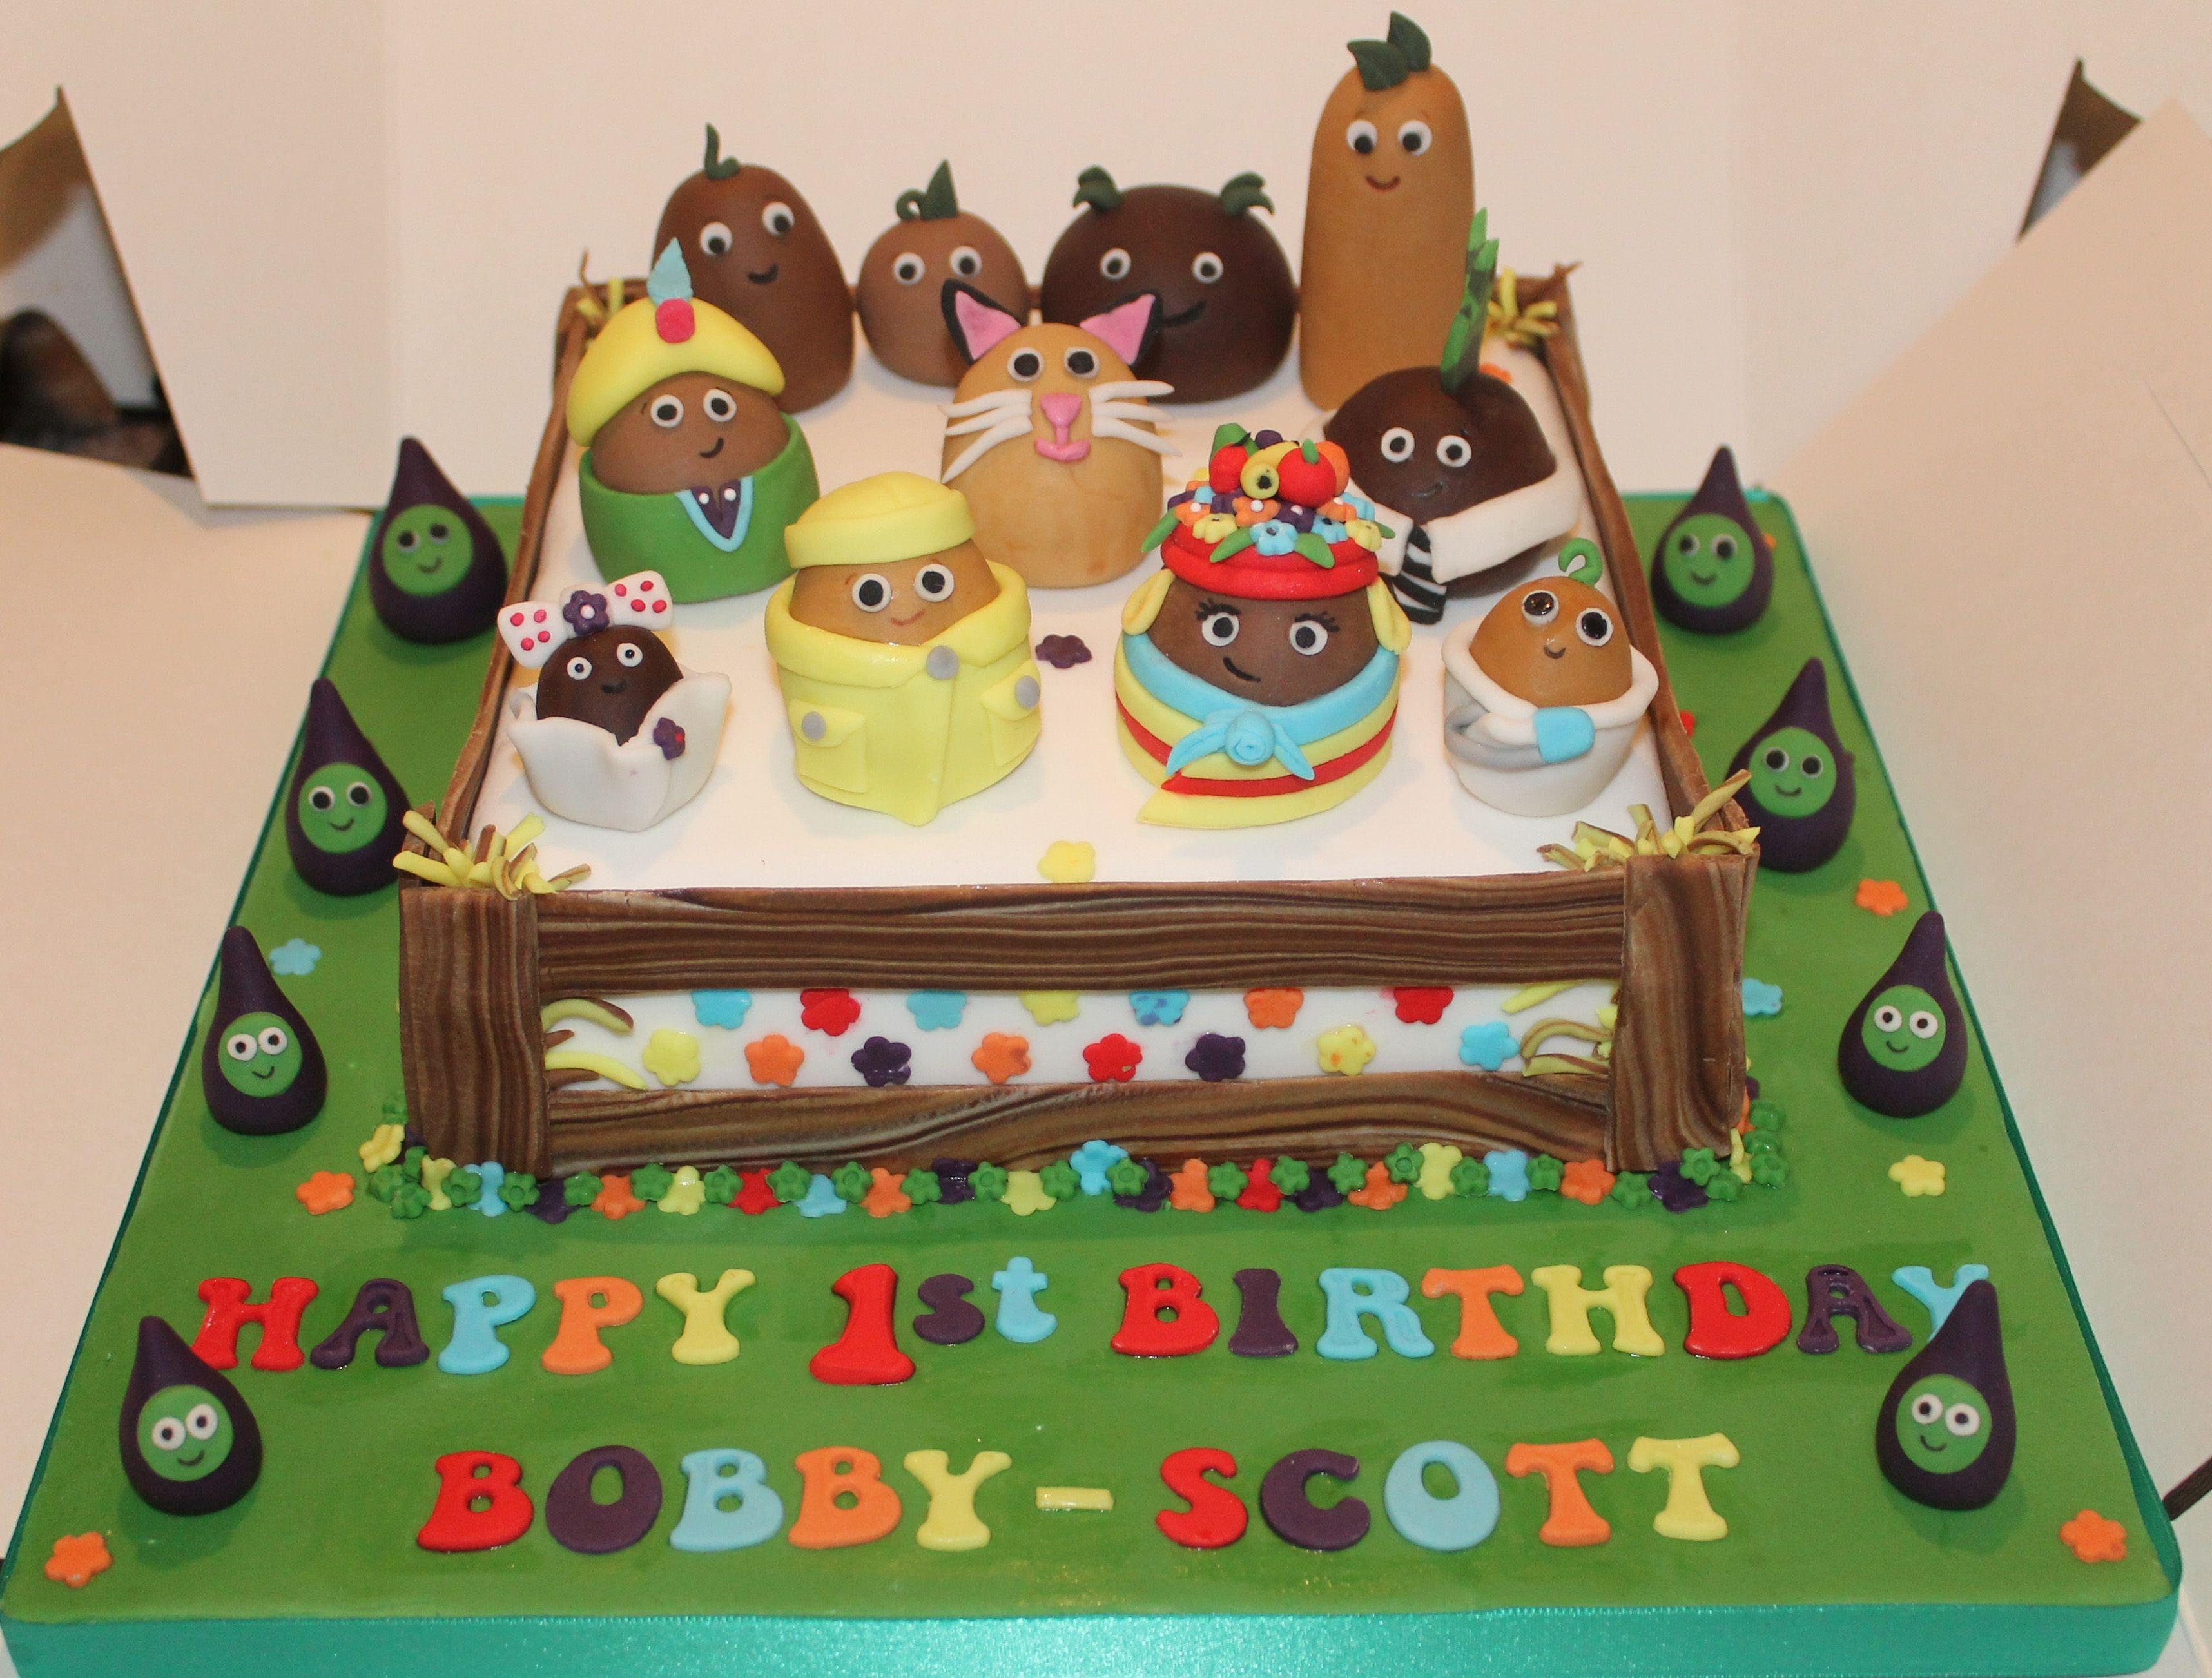 Awe Inspiring Small Potatoes Cake Childrens Birthday Cakes 3Rd Birthday Cakes Personalised Birthday Cards Paralily Jamesorg